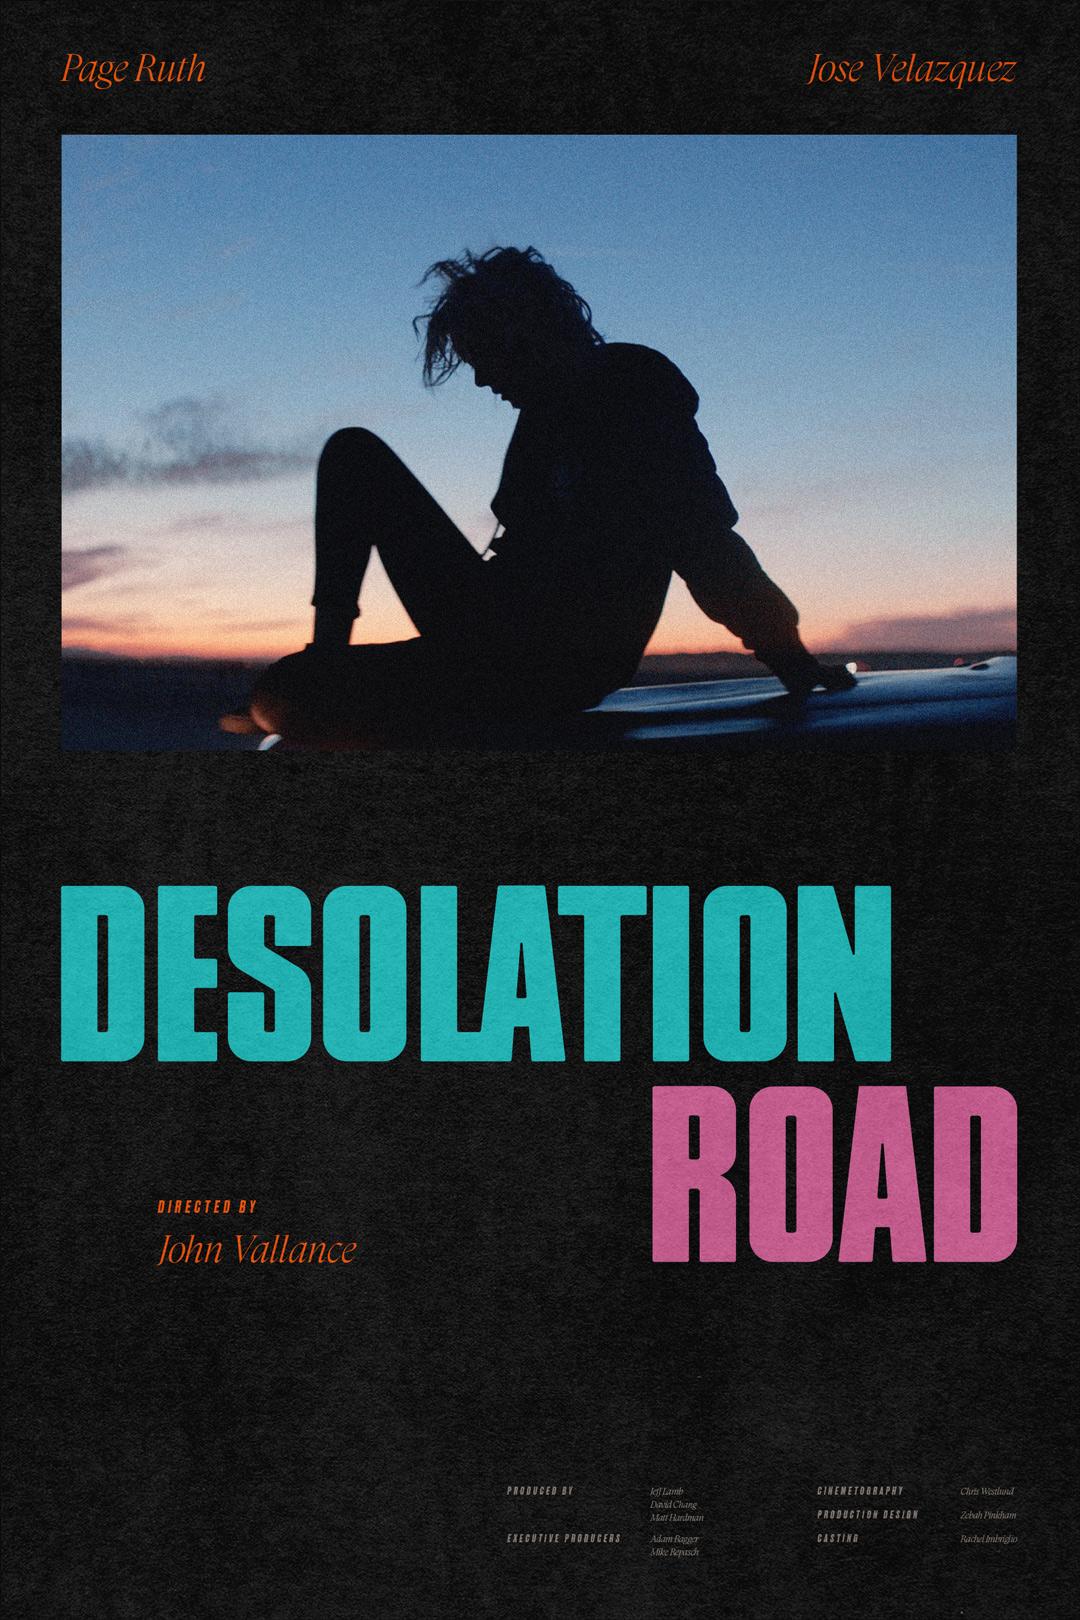 DesolationRoad-Poster-24x36–IG-2-2.jpg